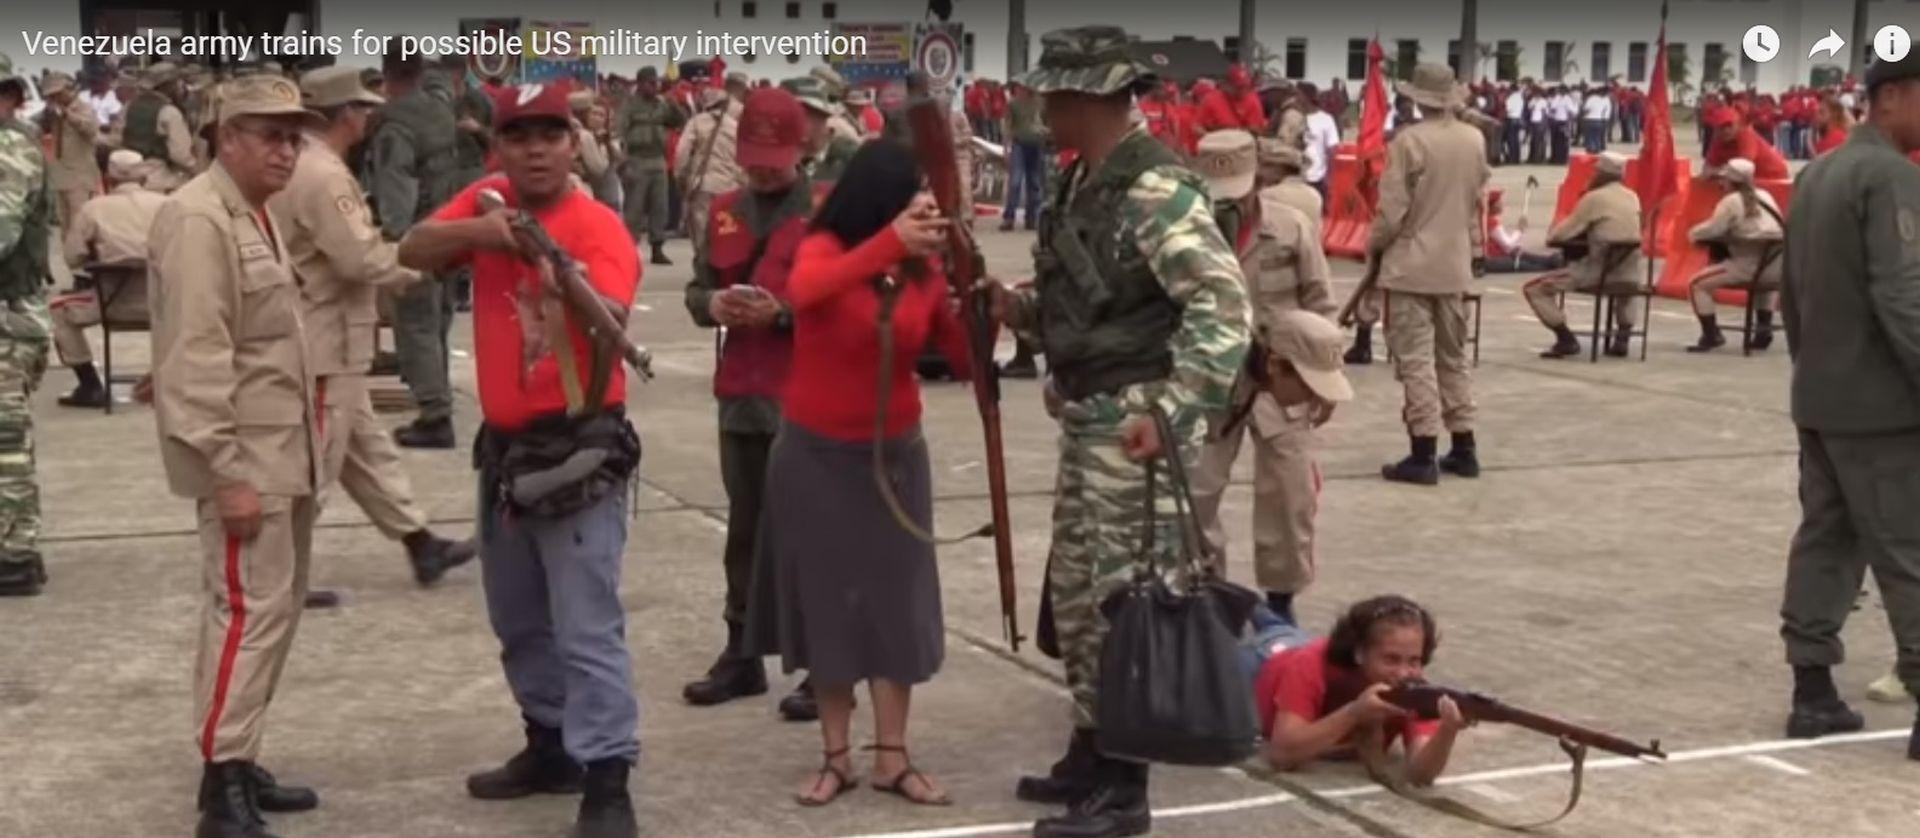 VIDEO: NAORUŽAN NAROD Venezuelanci se pripremaju za vatreni doček američke vojske